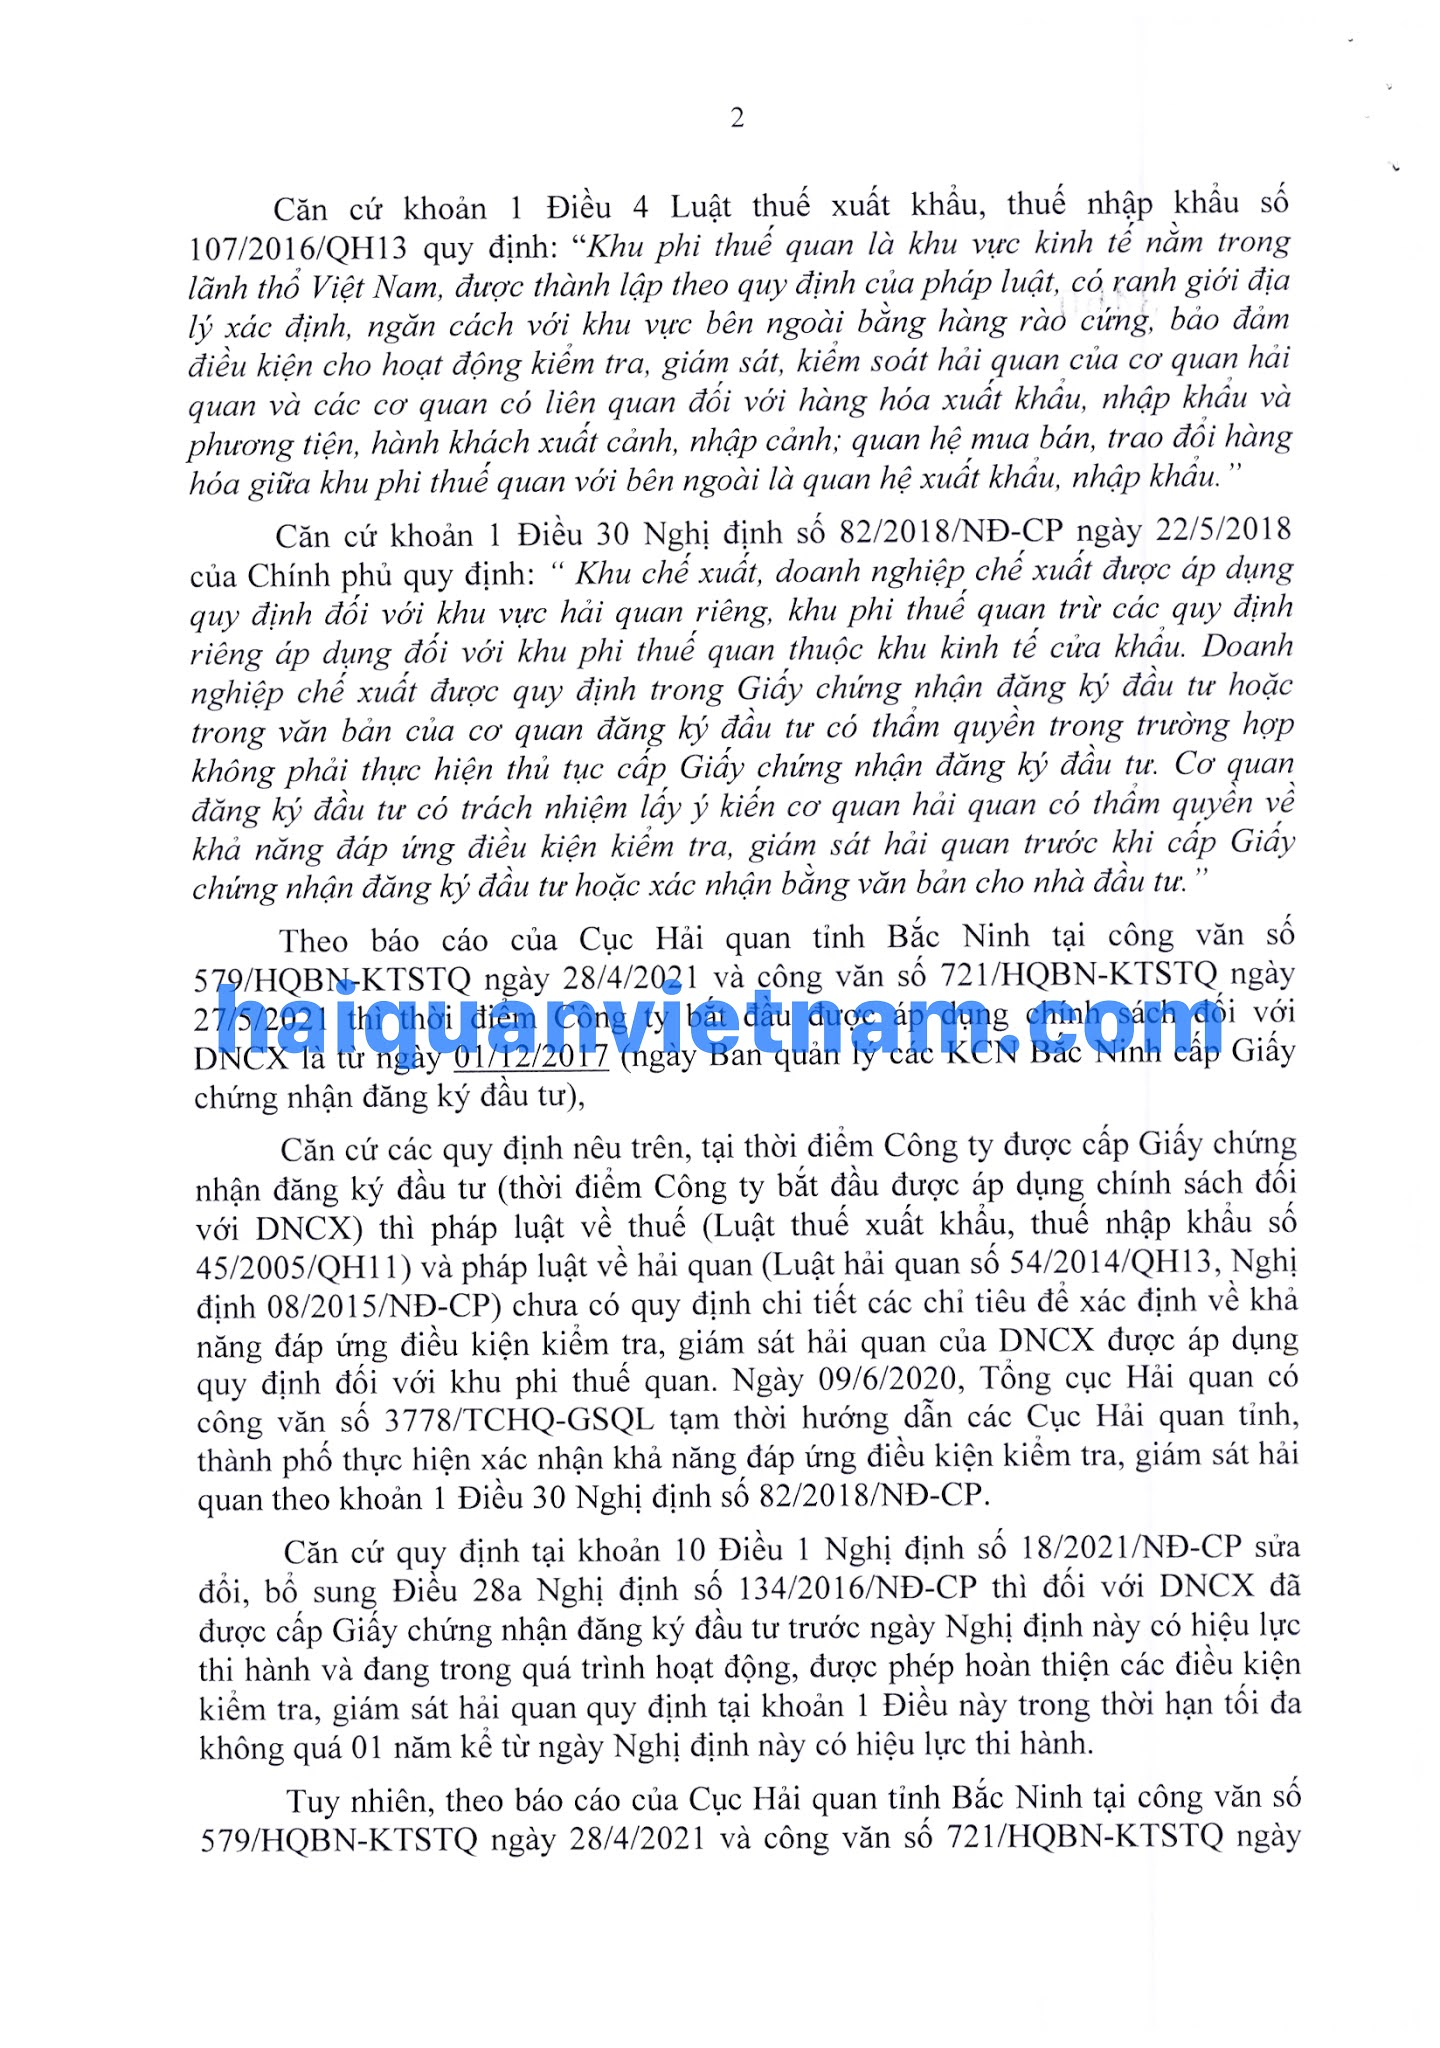 [Image: 210709-3460-TCHQ-TXNK_haiquanvietnam_02.jpg]